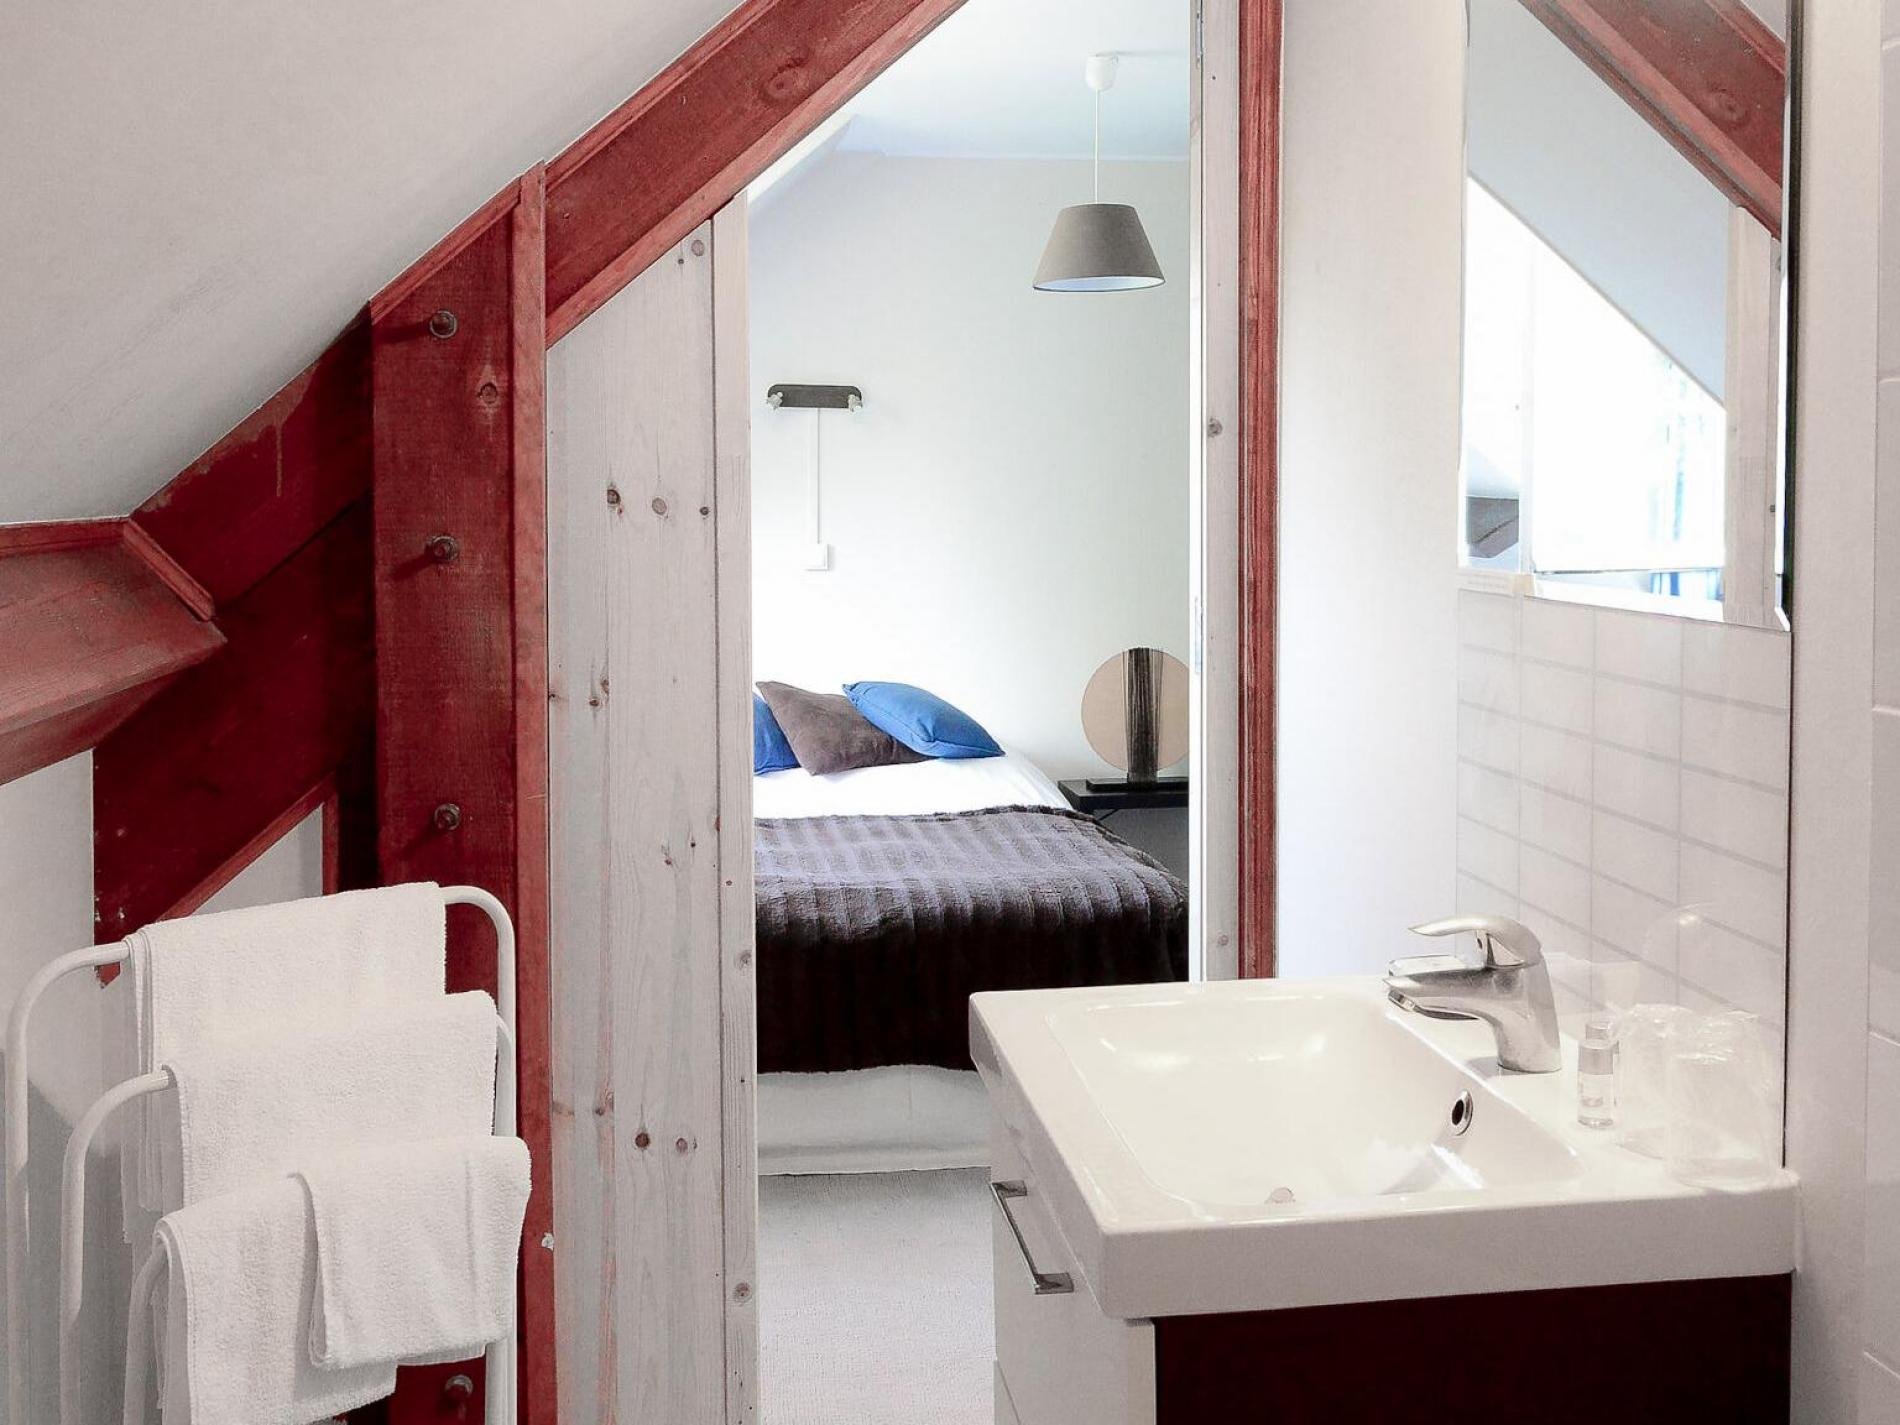 Chambres Hotel Hougate Proche Cabourg Et Deauville En